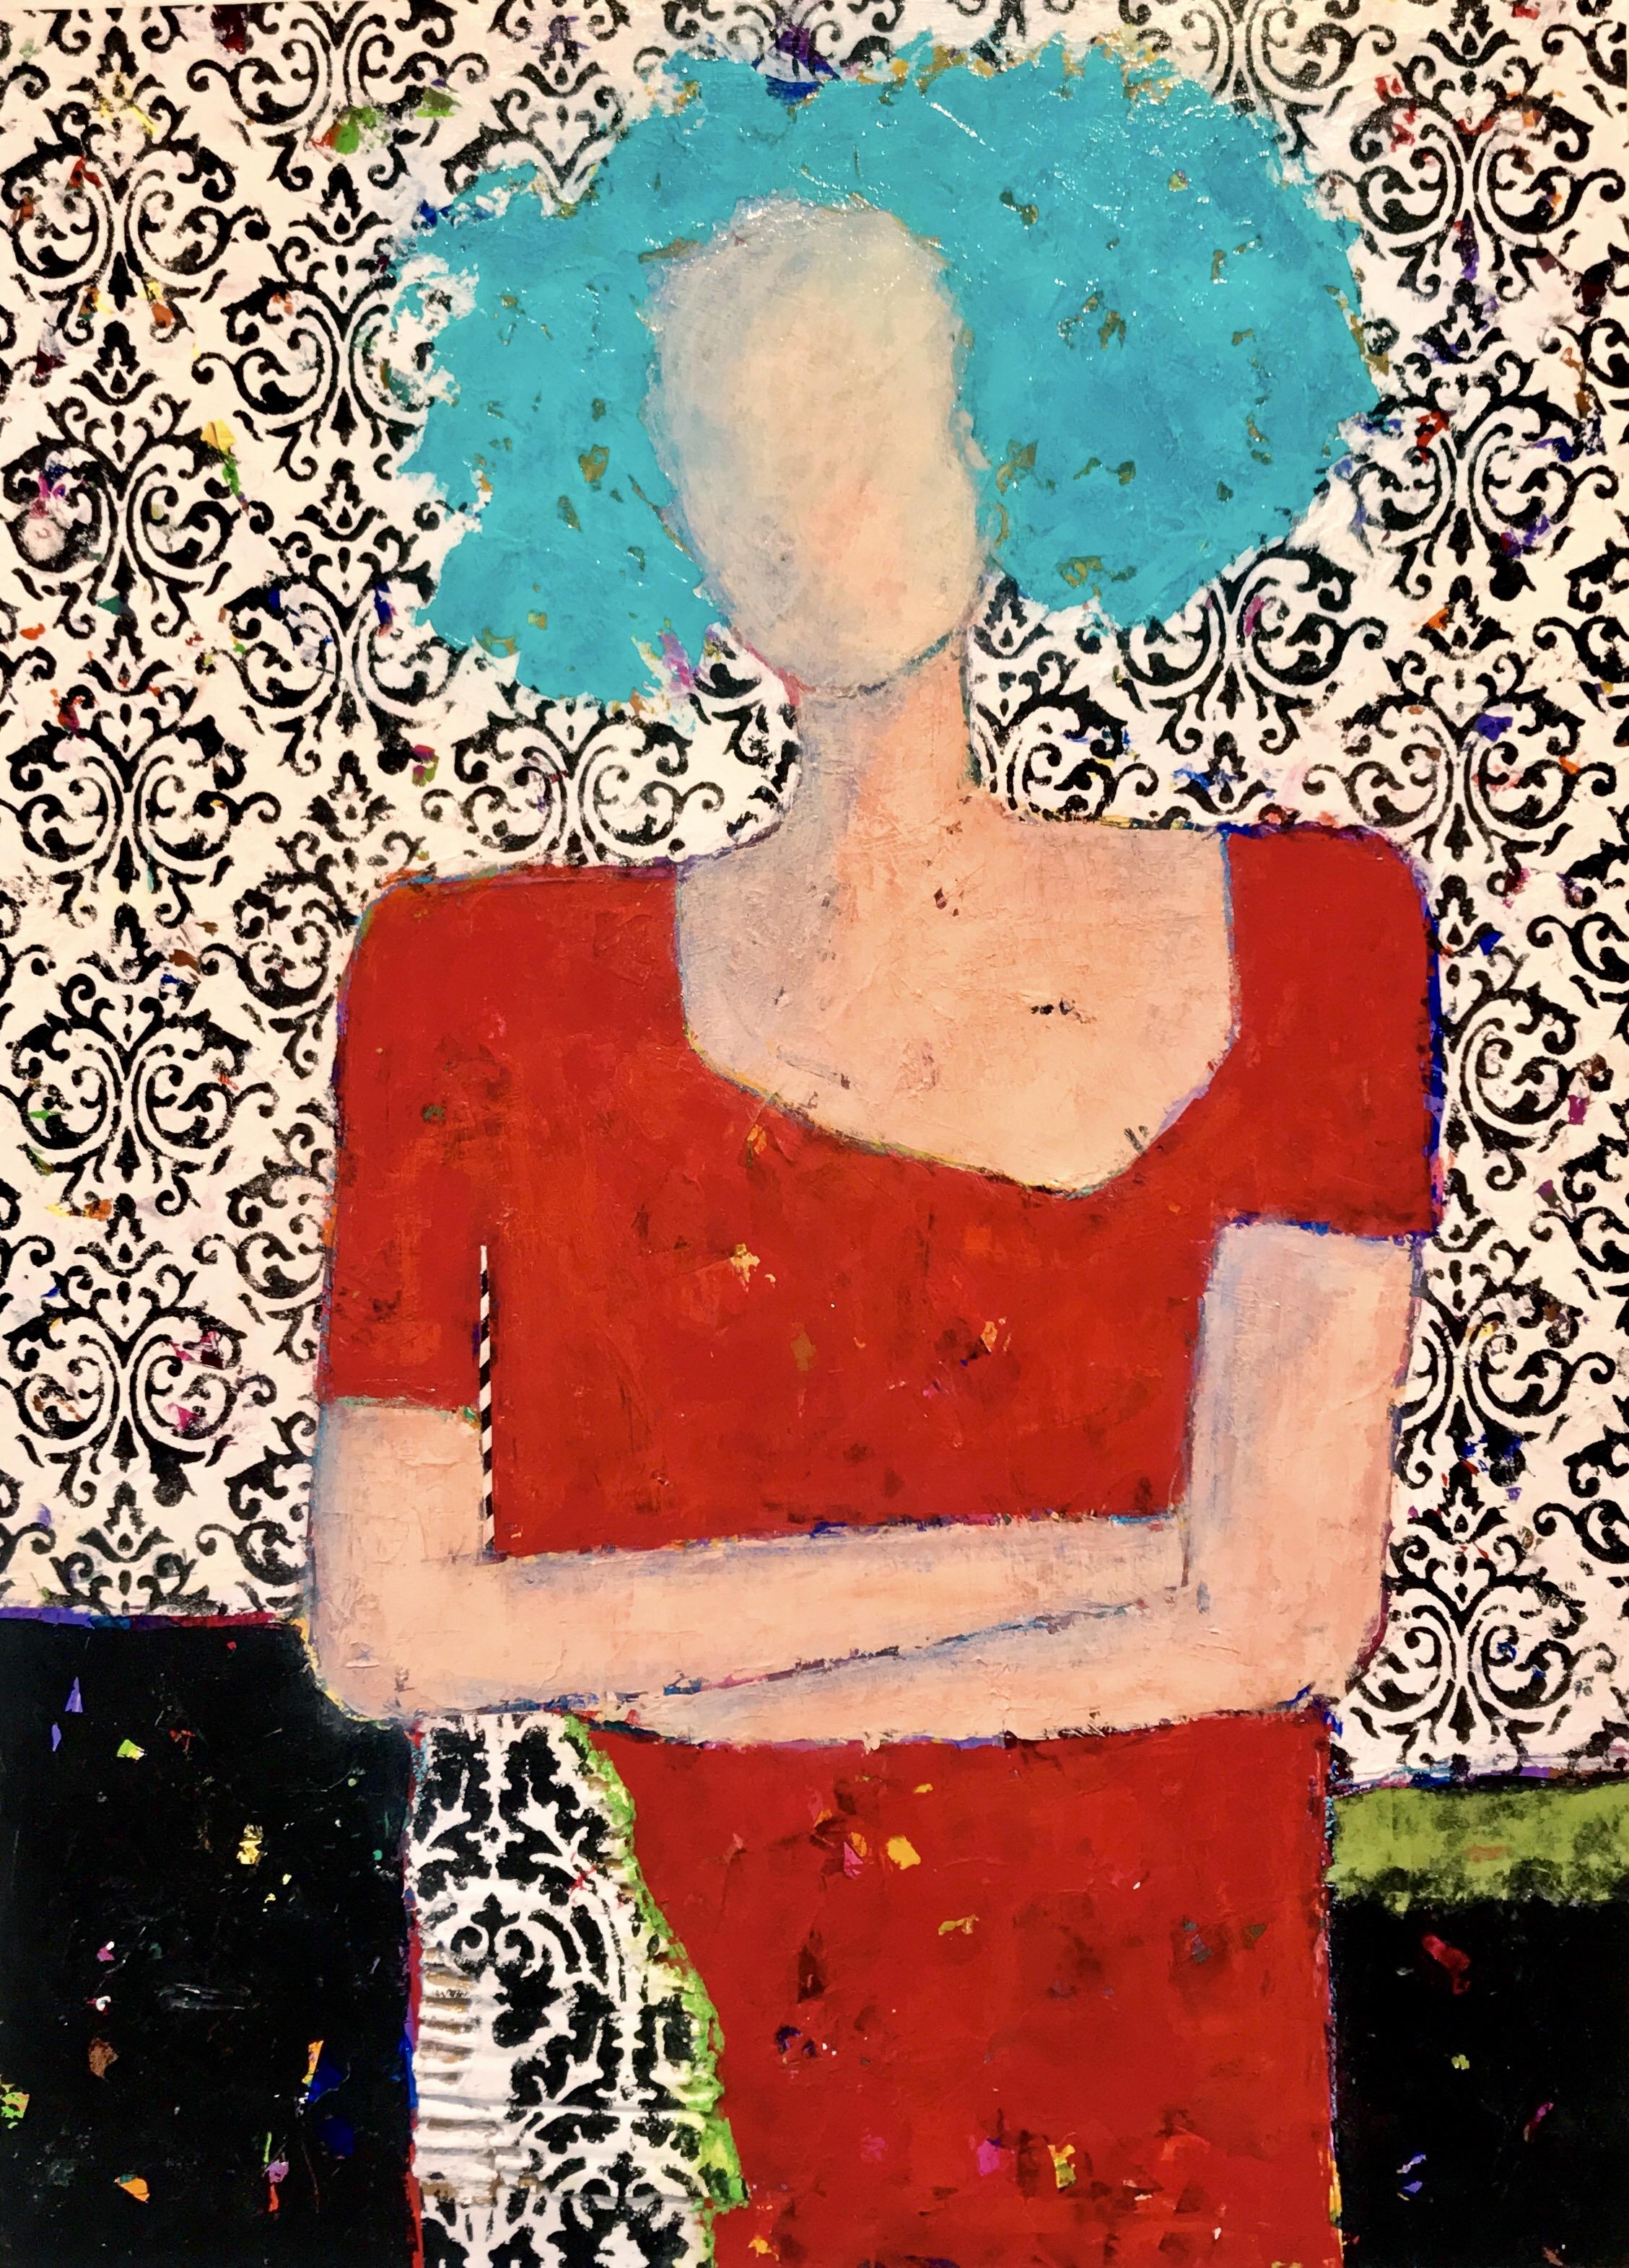 Foundry Gallery-Charlene Nield-Bexley-30x22-Acrylic with mixed media-2018-$1200.jpg